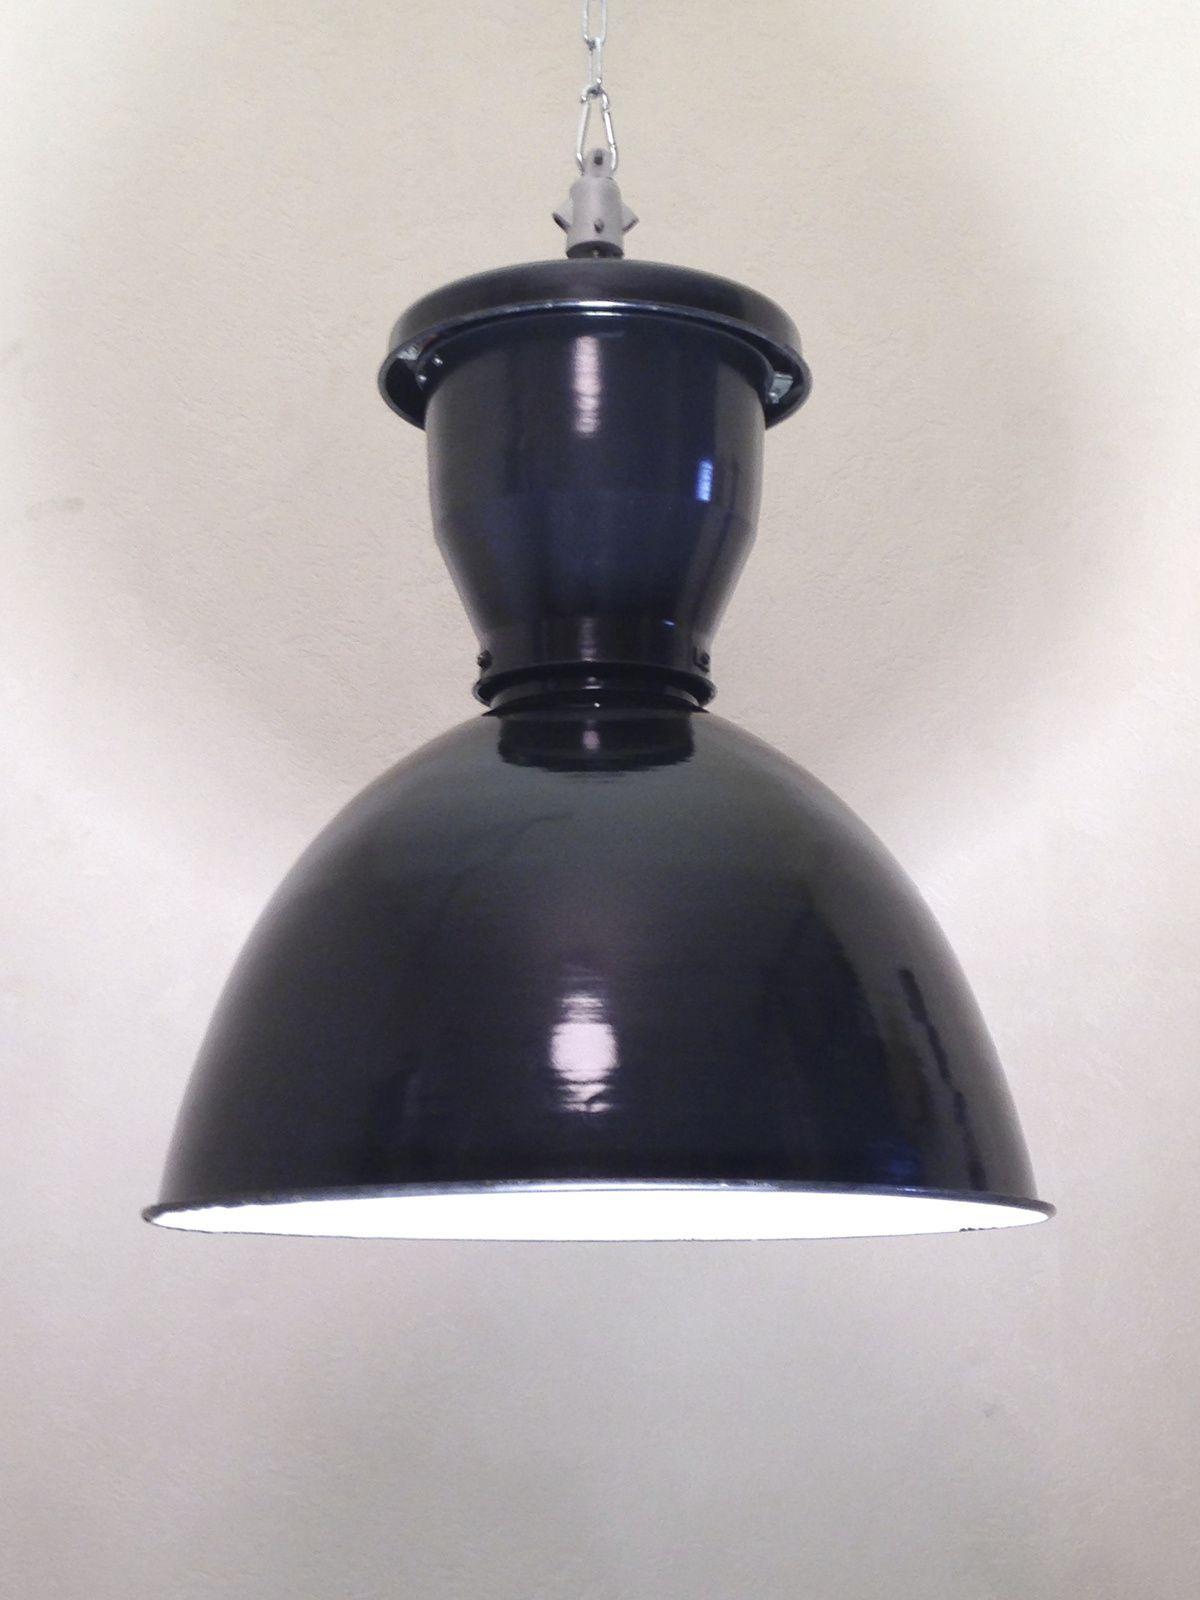 Vieilles lampes industrielles Mazda.